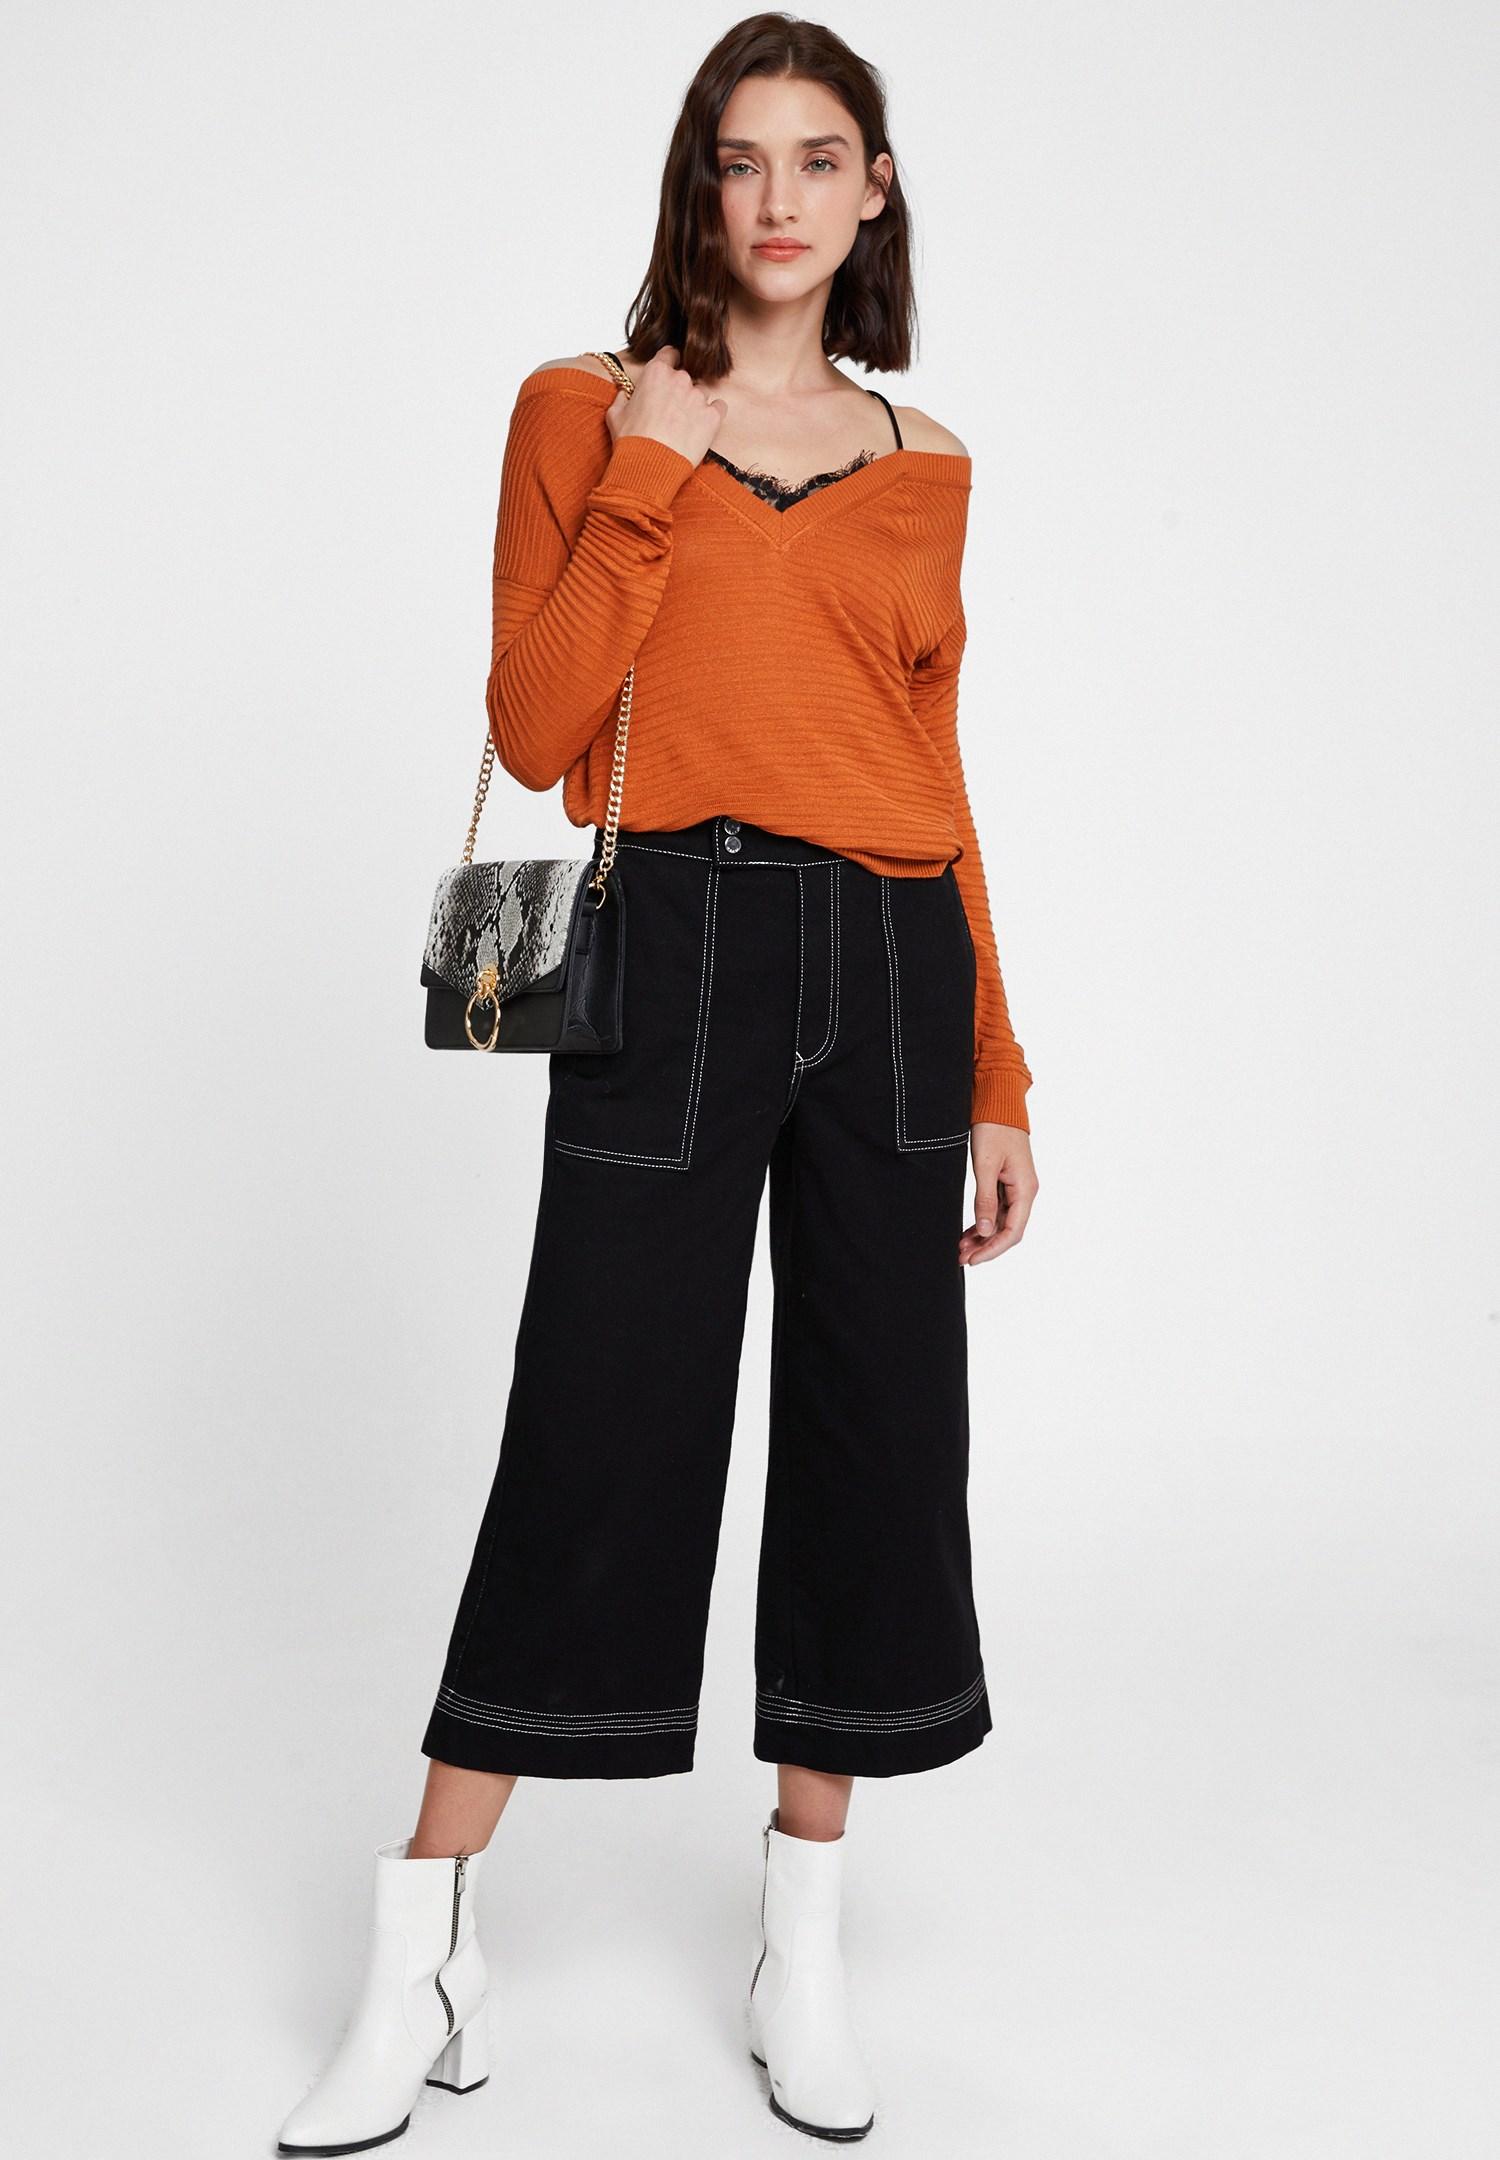 Women Mixed Snakeskin Print Handbag with Details